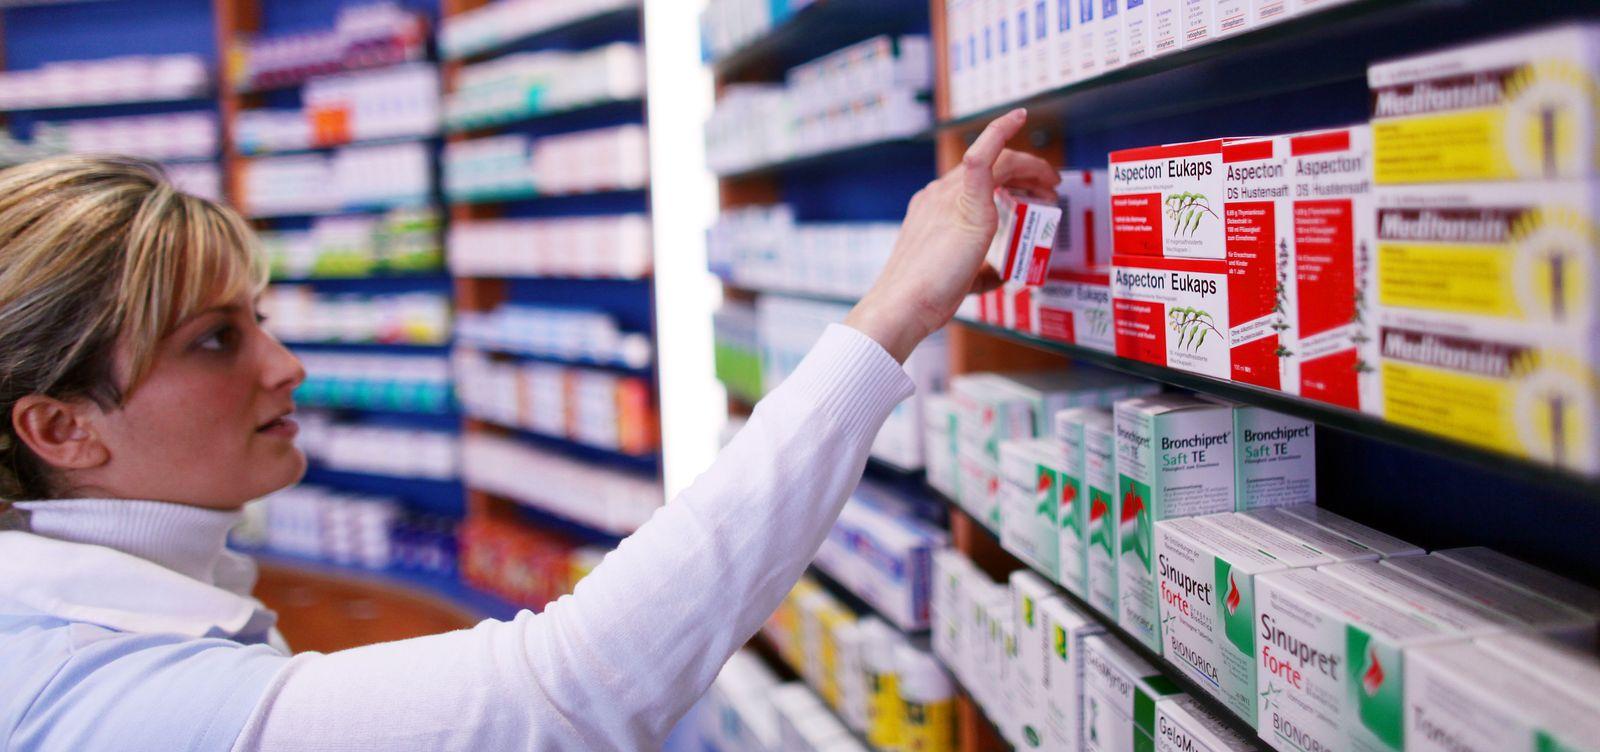 Apotheke / Arzneimittel / Medikamente